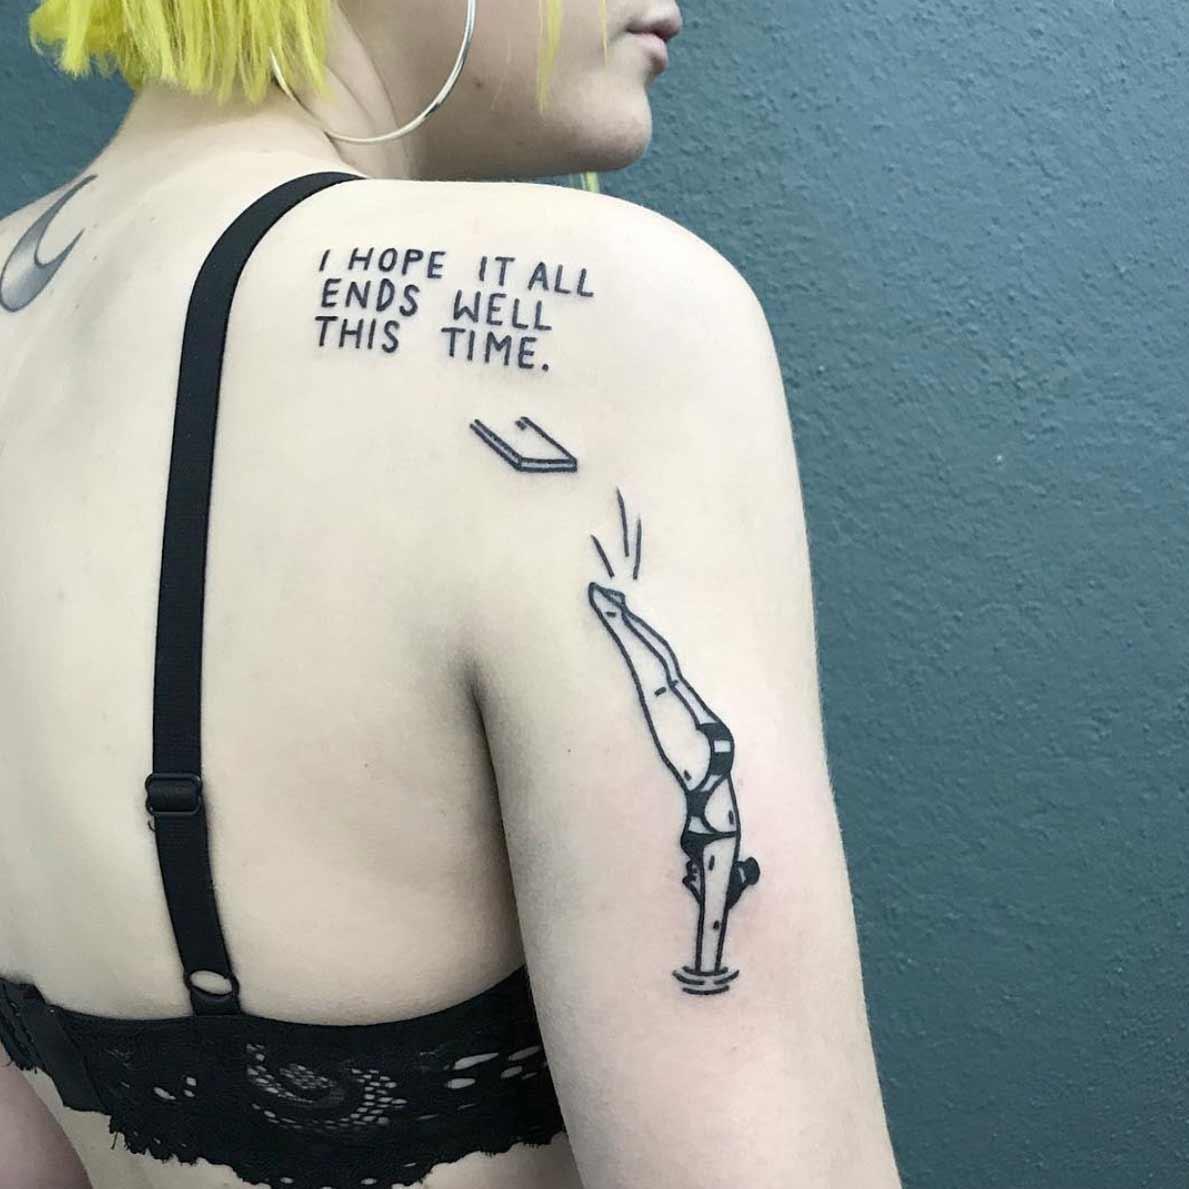 Sarkastische Tattoos von The Magic Rosa The-magic-rosa-tattoos-berlin_04